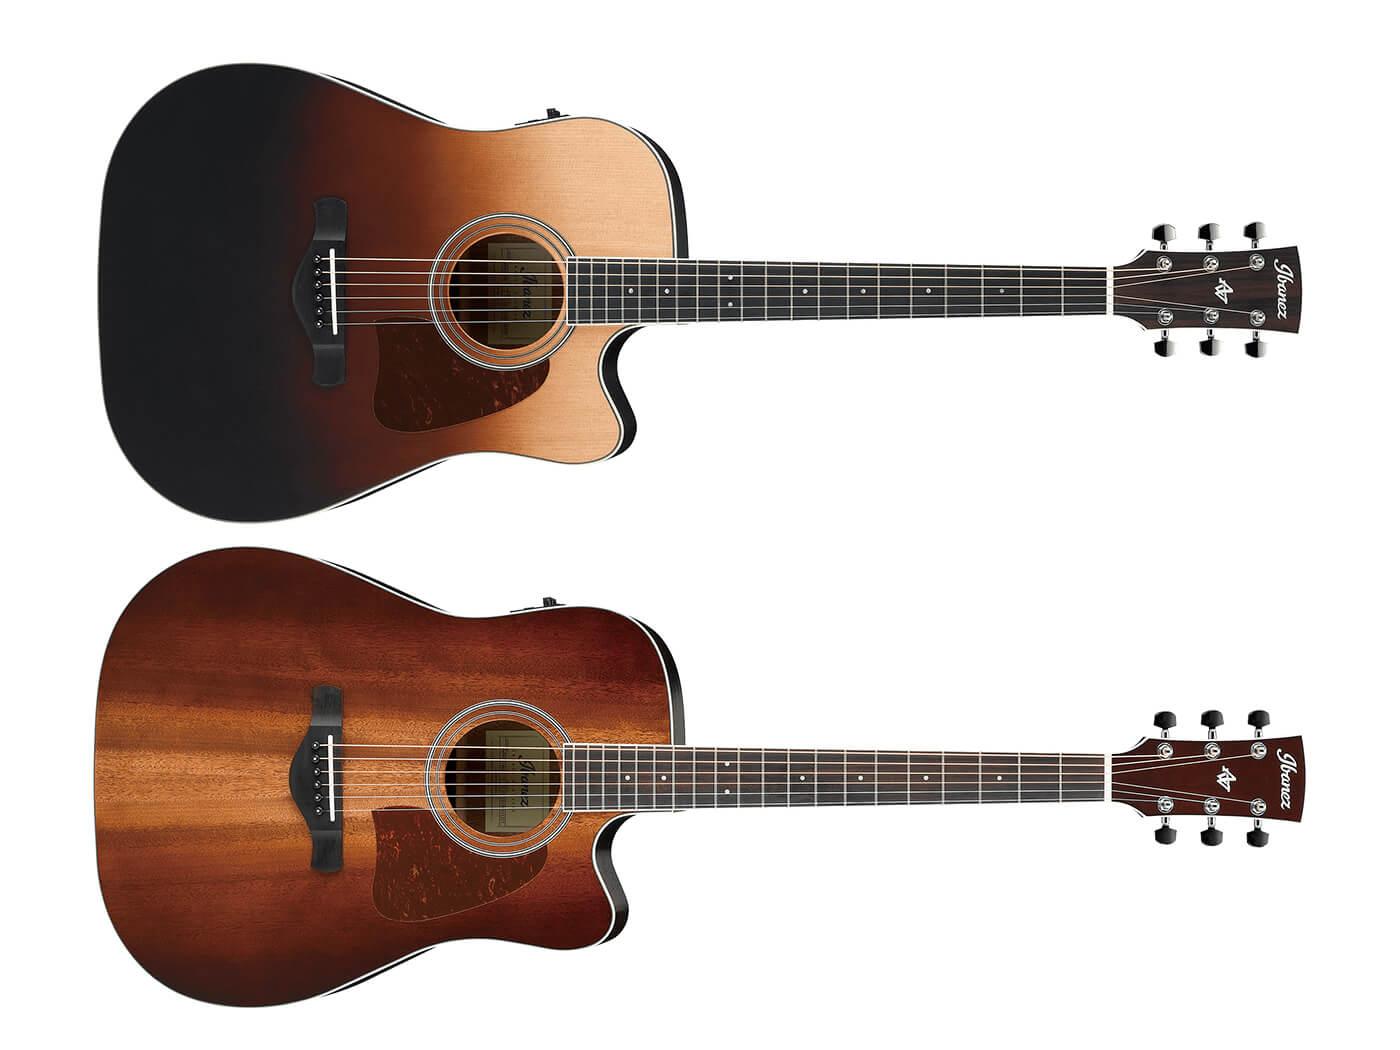 Ibanez Artwood Acoustics